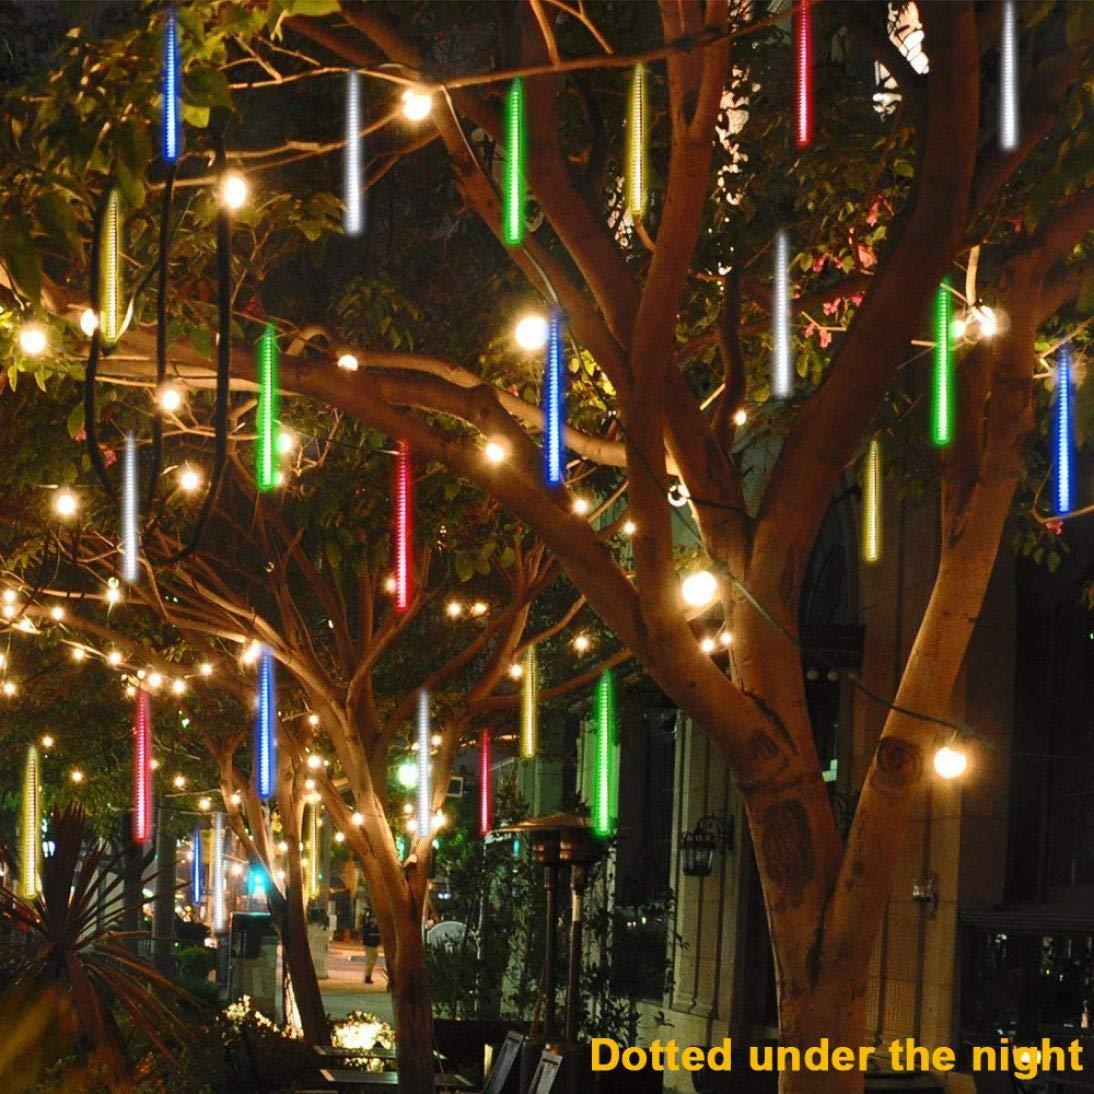 coersd Outdoor String Lights, Party LED Lights Meteor Shower Rain Snowfall Xmas Tree Garden Outdoor (Multicolor) by coersd (Image #1)